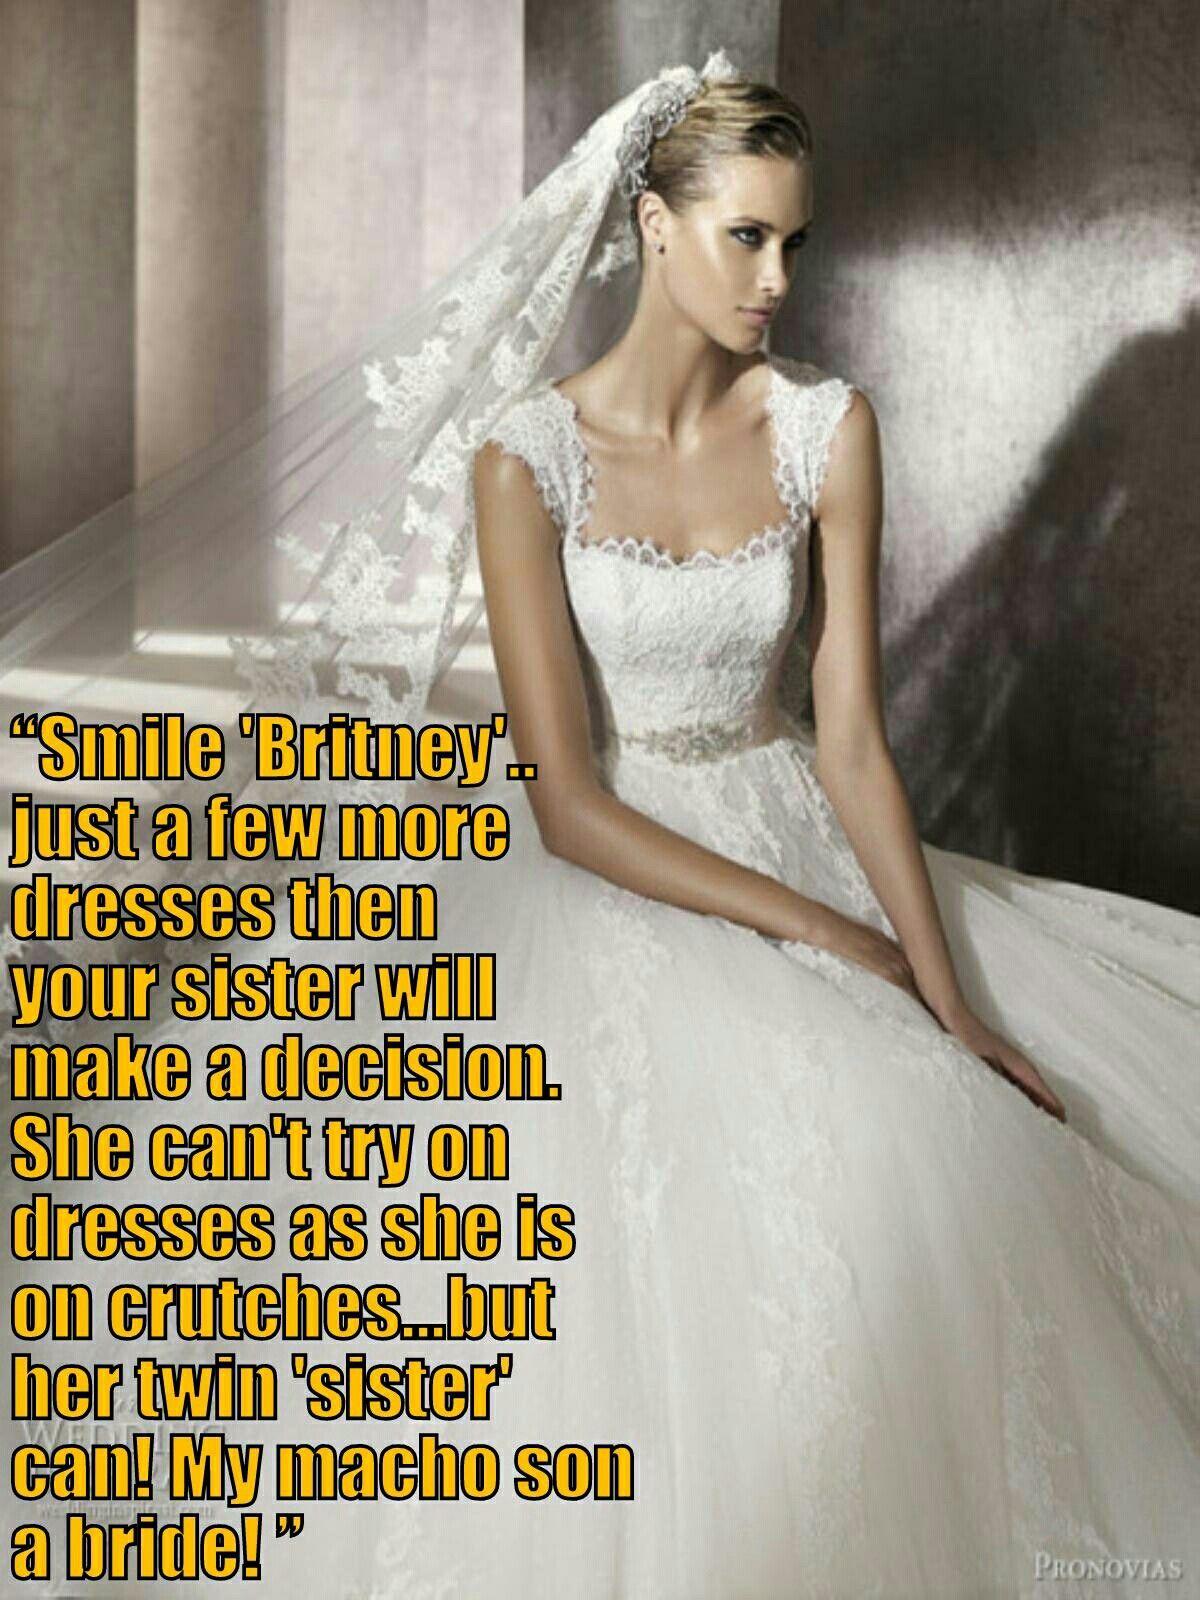 stories Transvestite bridesmaid